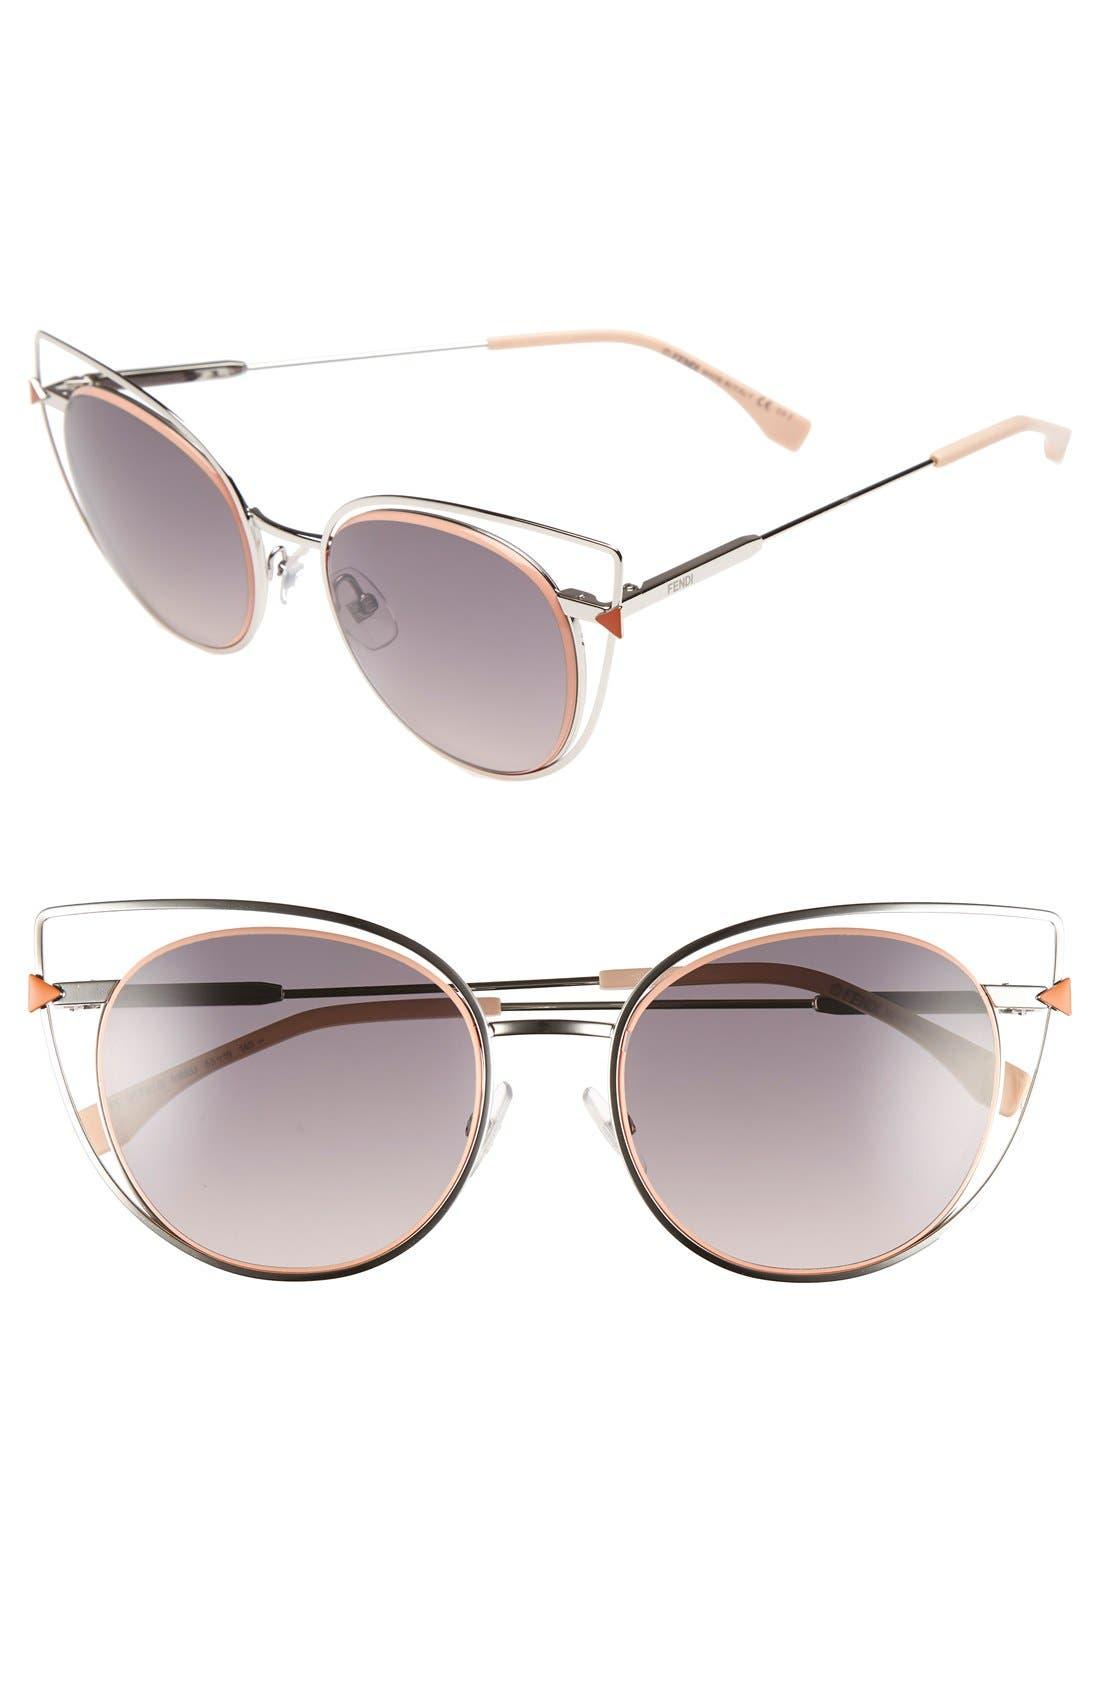 53mm Sunglasses,                             Main thumbnail 2, color,